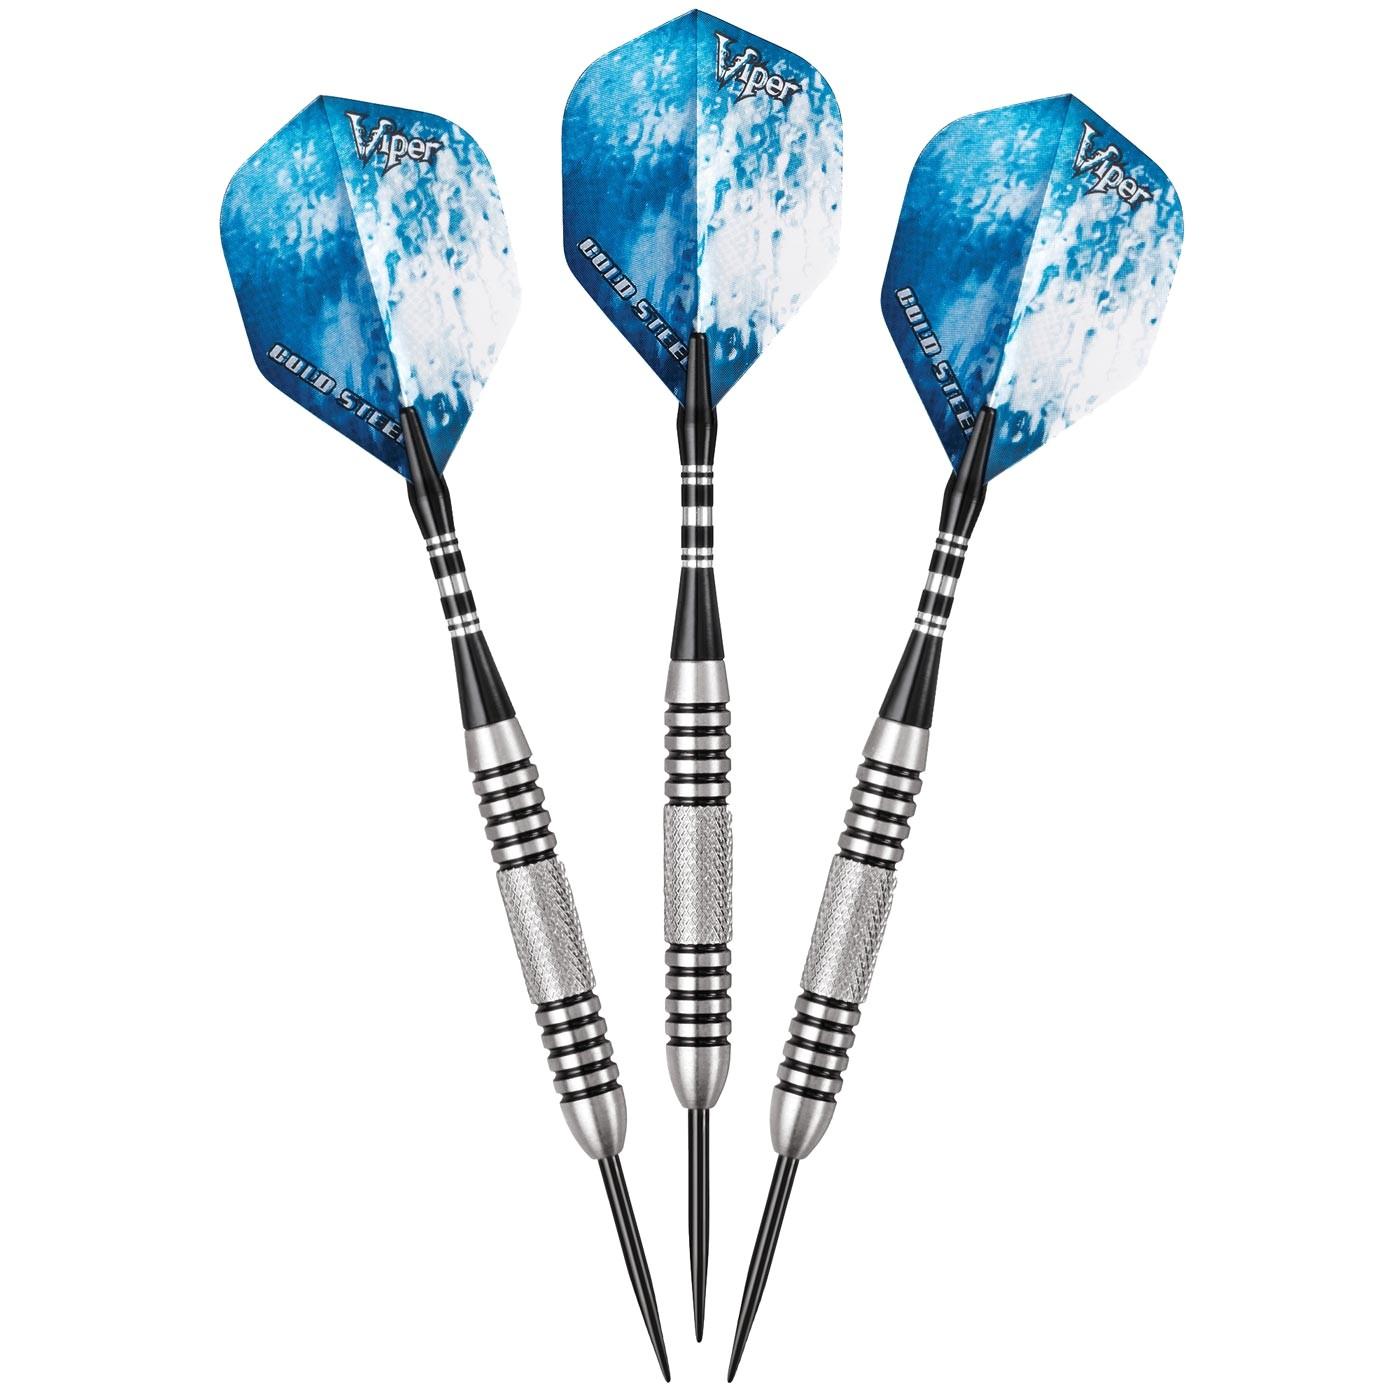 viper cold steel steel tip darts